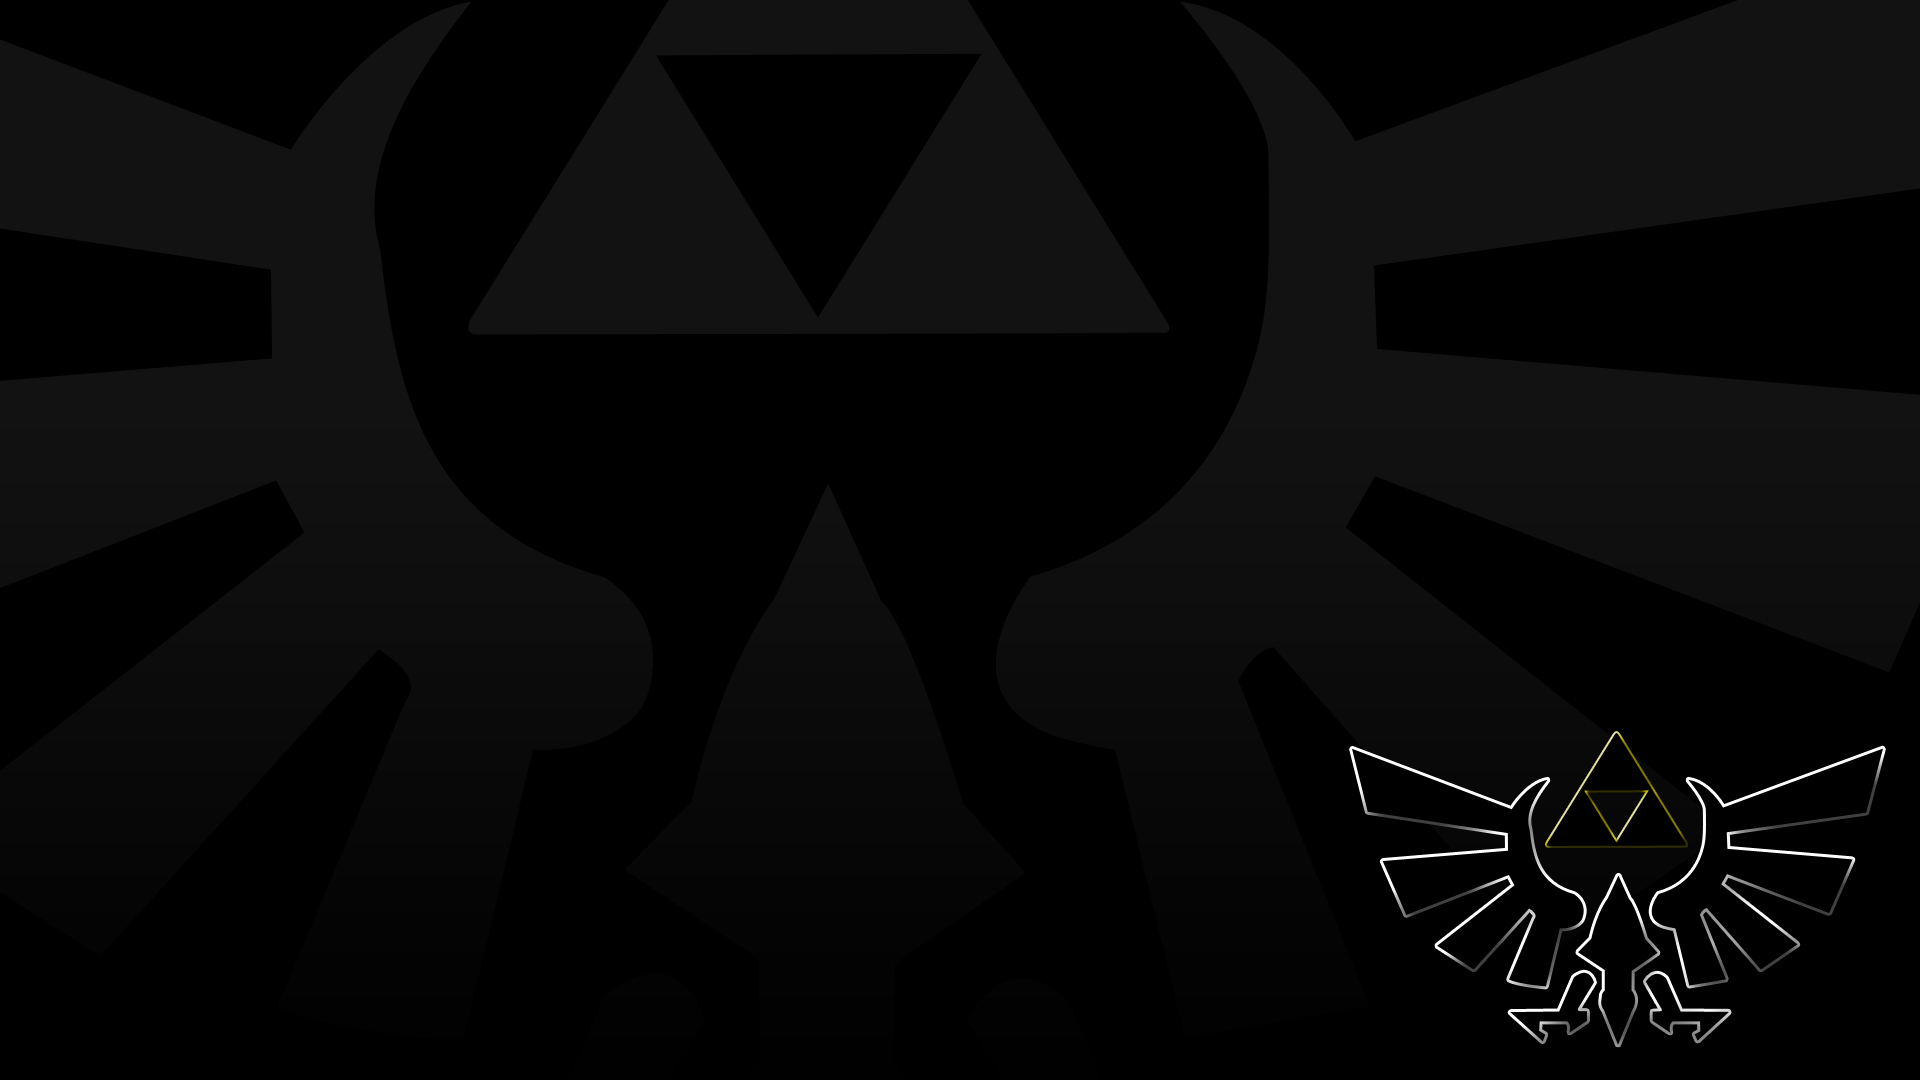 Zelda Wallpaper 1920x1080 Triforce Video games triforce T...